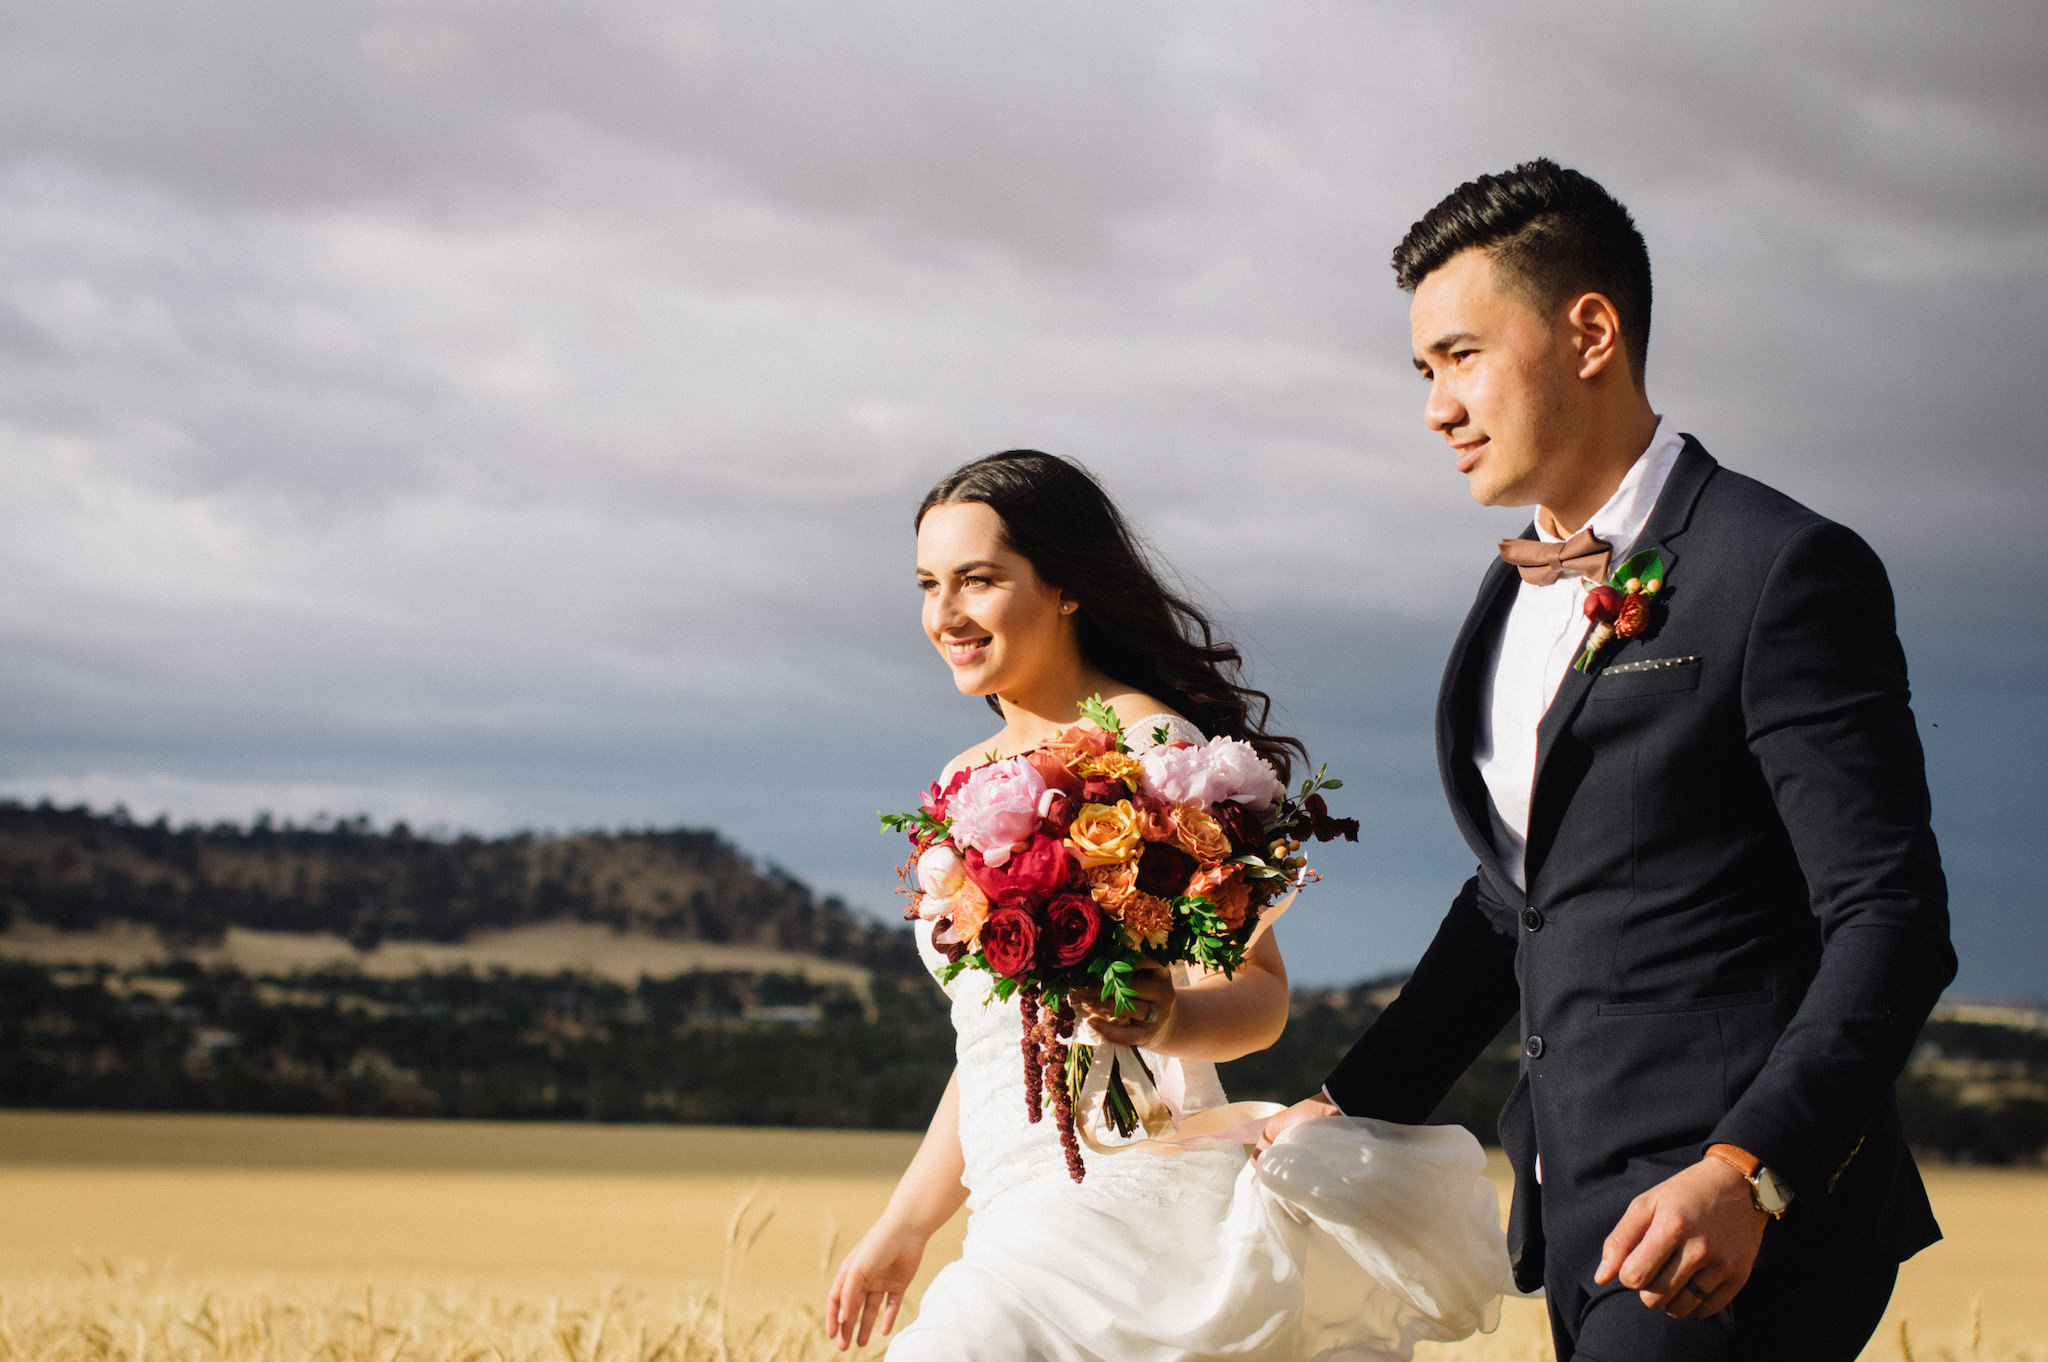 Avon Valley Wheat Field Sarah Marvin York Wedding Photographer 3